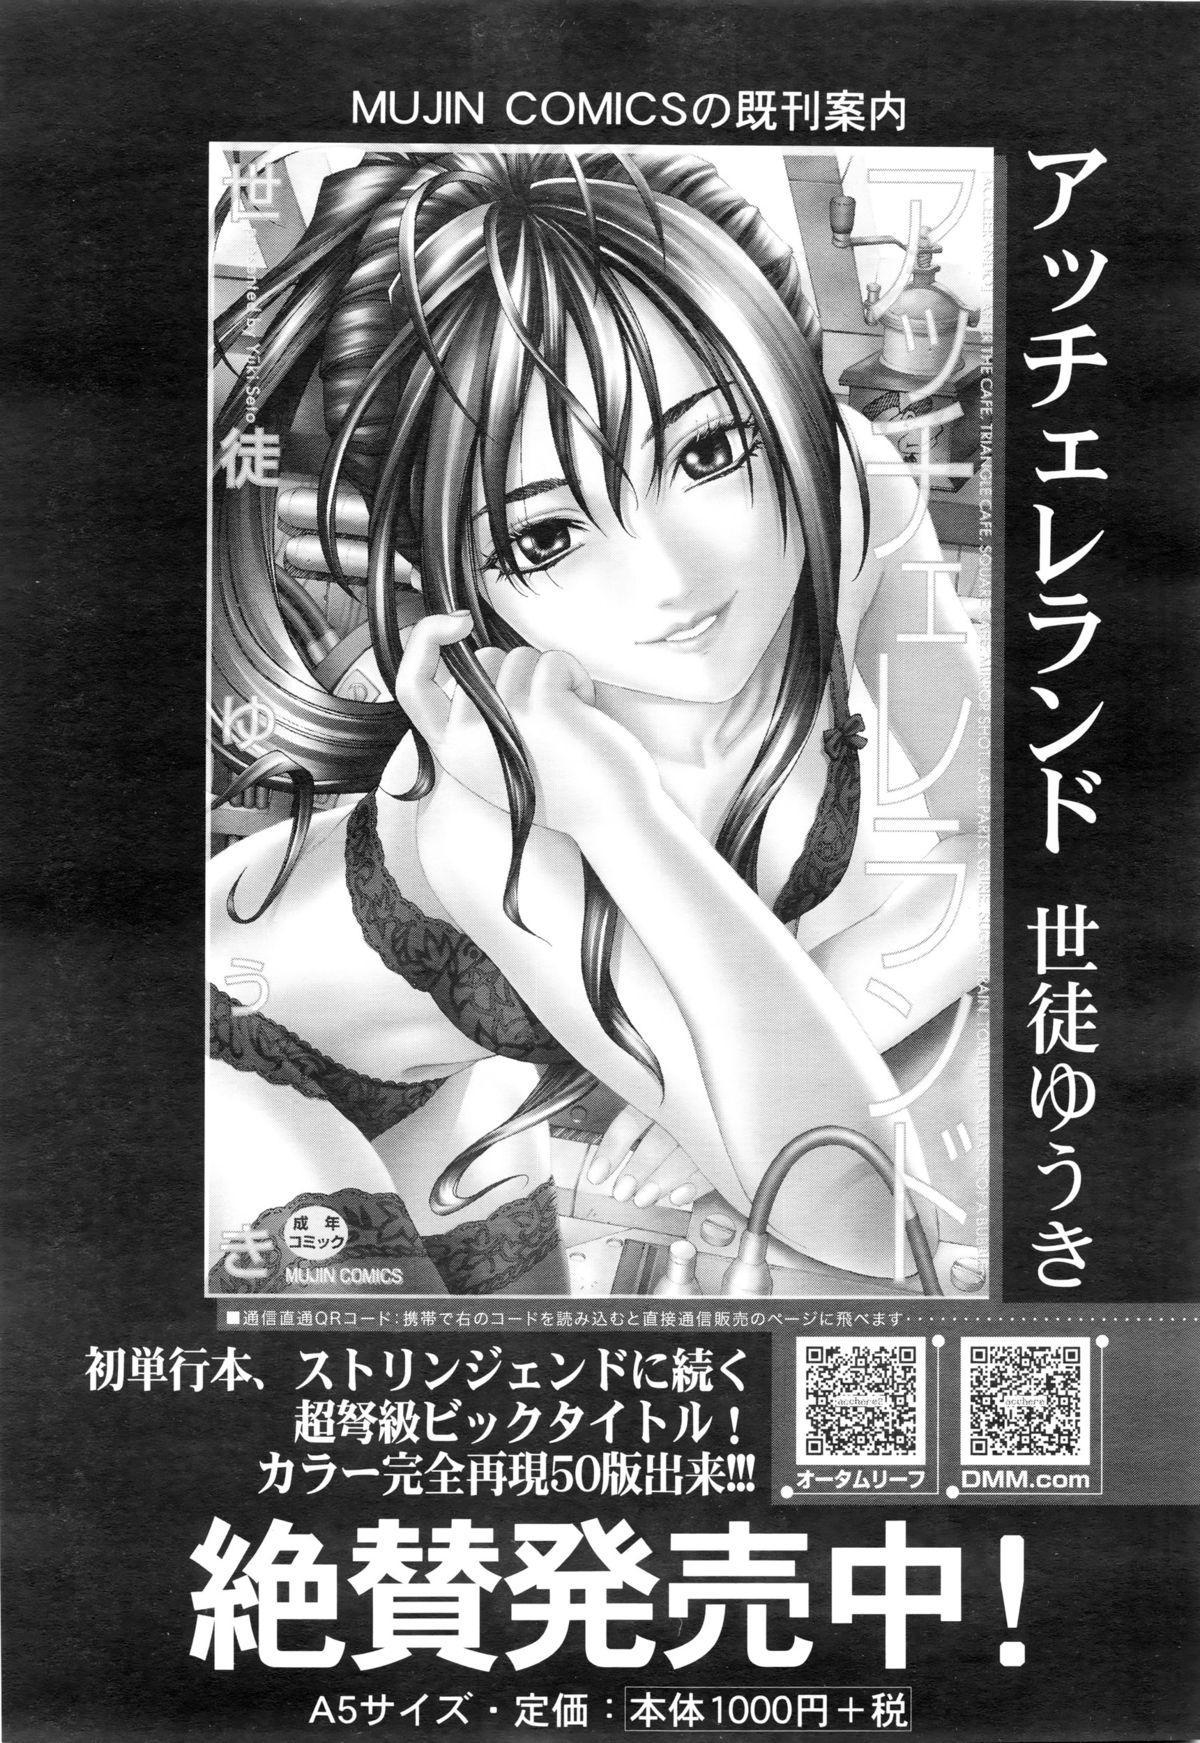 COMIC Mugen Tensei 2016-01 28